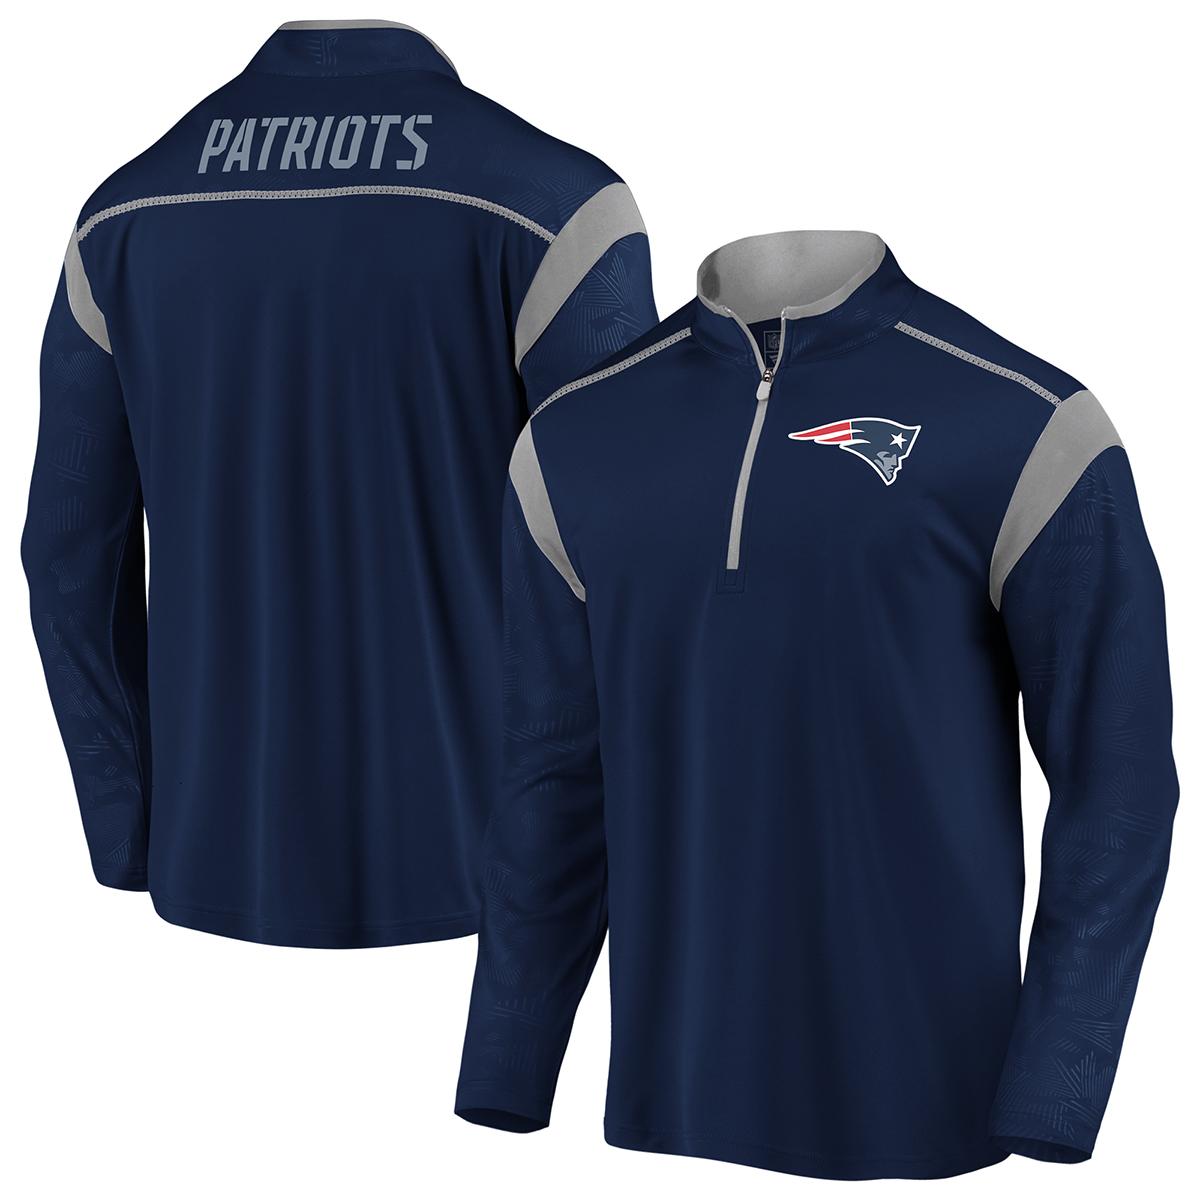 New England Patriots Men's Defender Mission 14-Zip Pullover - Blue, XL